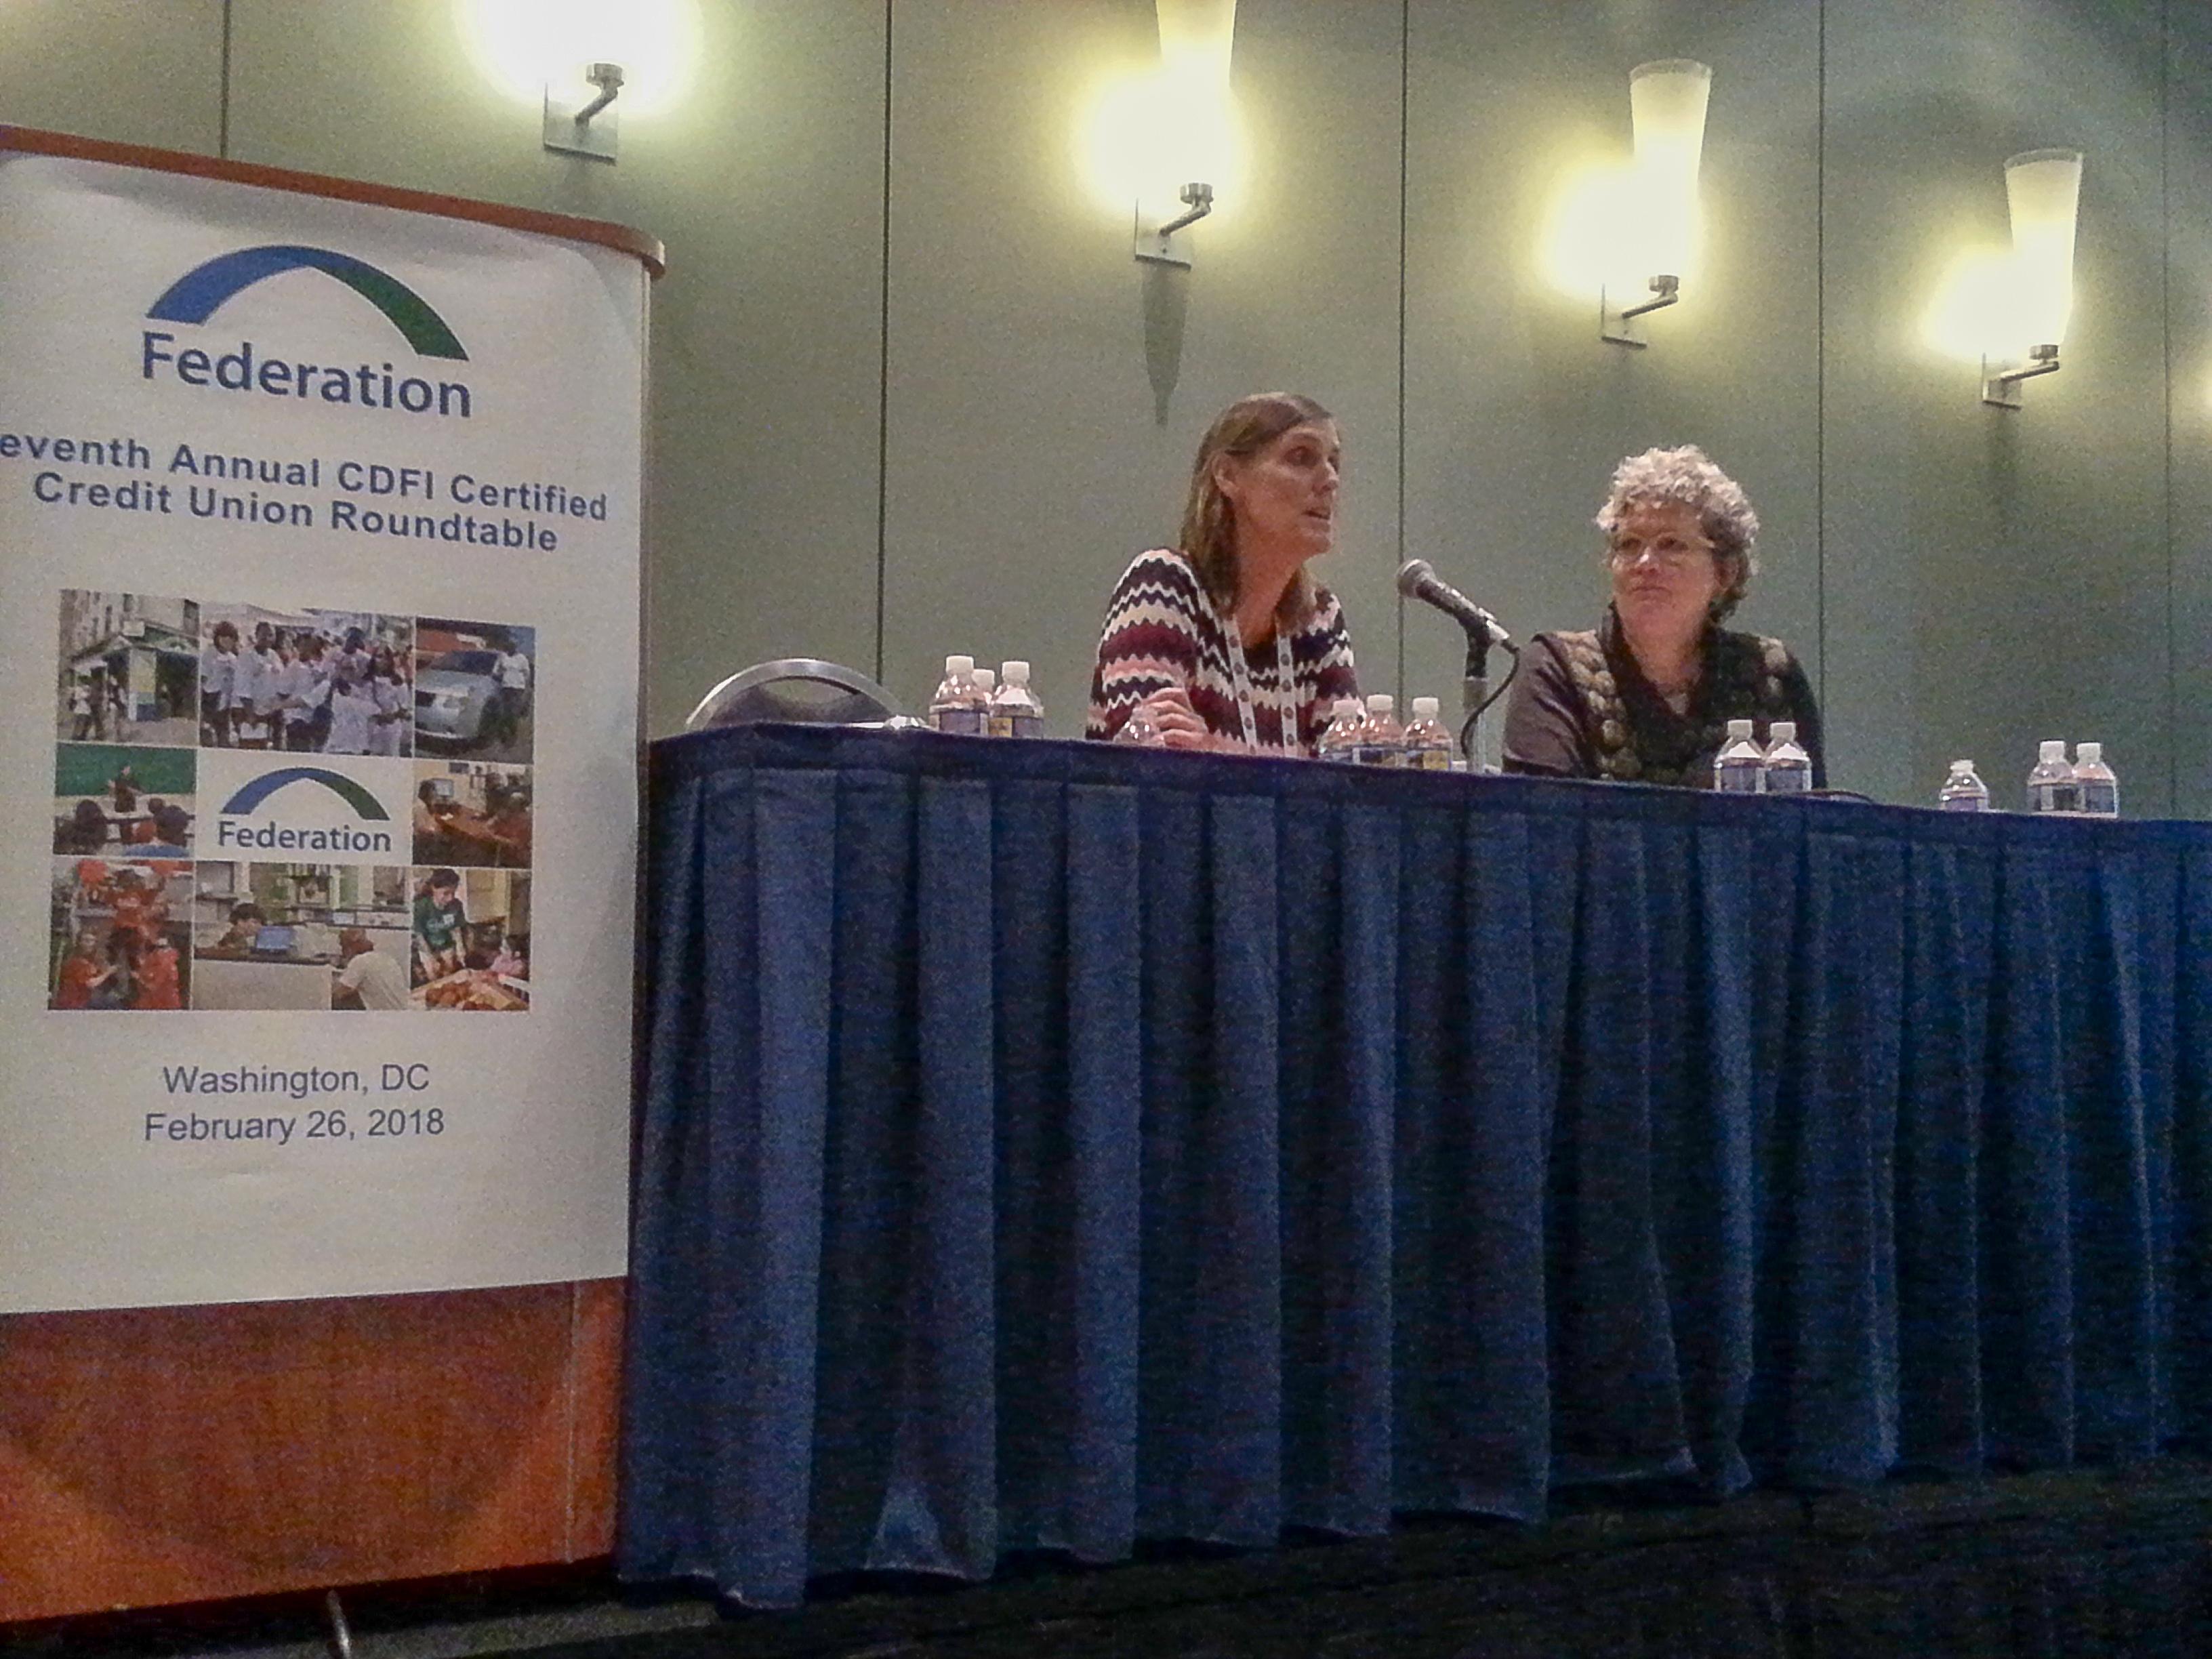 Cathie & Annie Donovan CDFI Roundtable